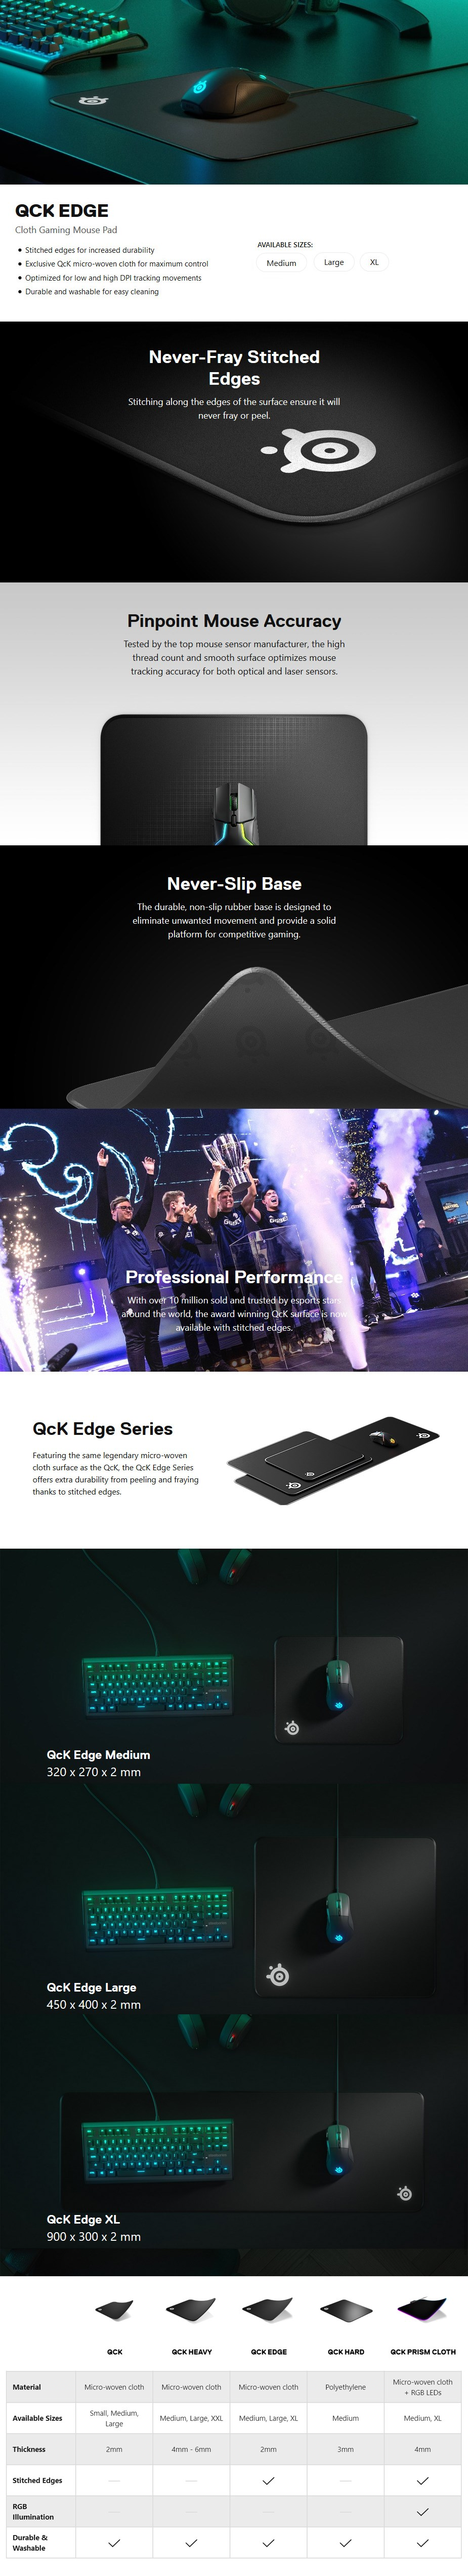 SteelSeries QcK Edge Gaming Mouse Pad - Medium - Desktop Overview 1